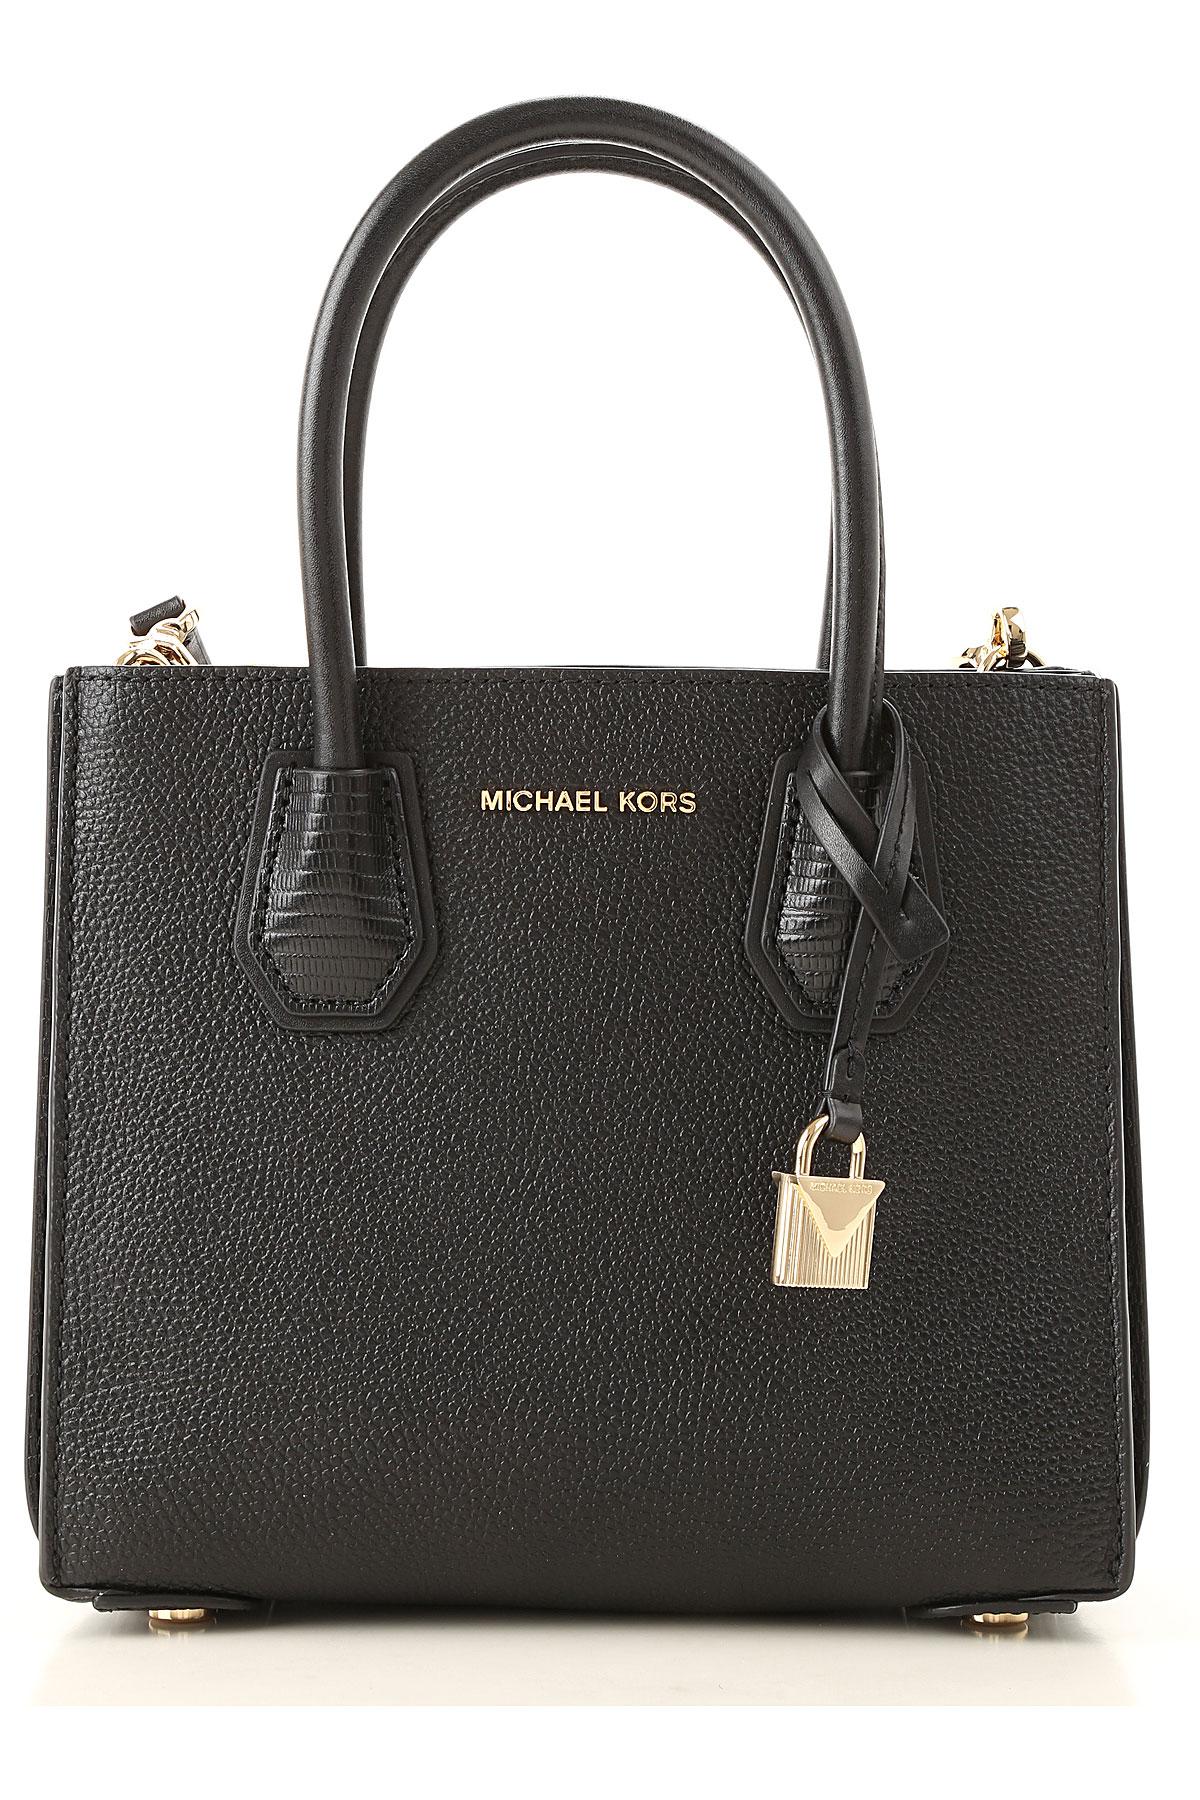 Michael Kors Tote Bag, Black, Leather, 2019